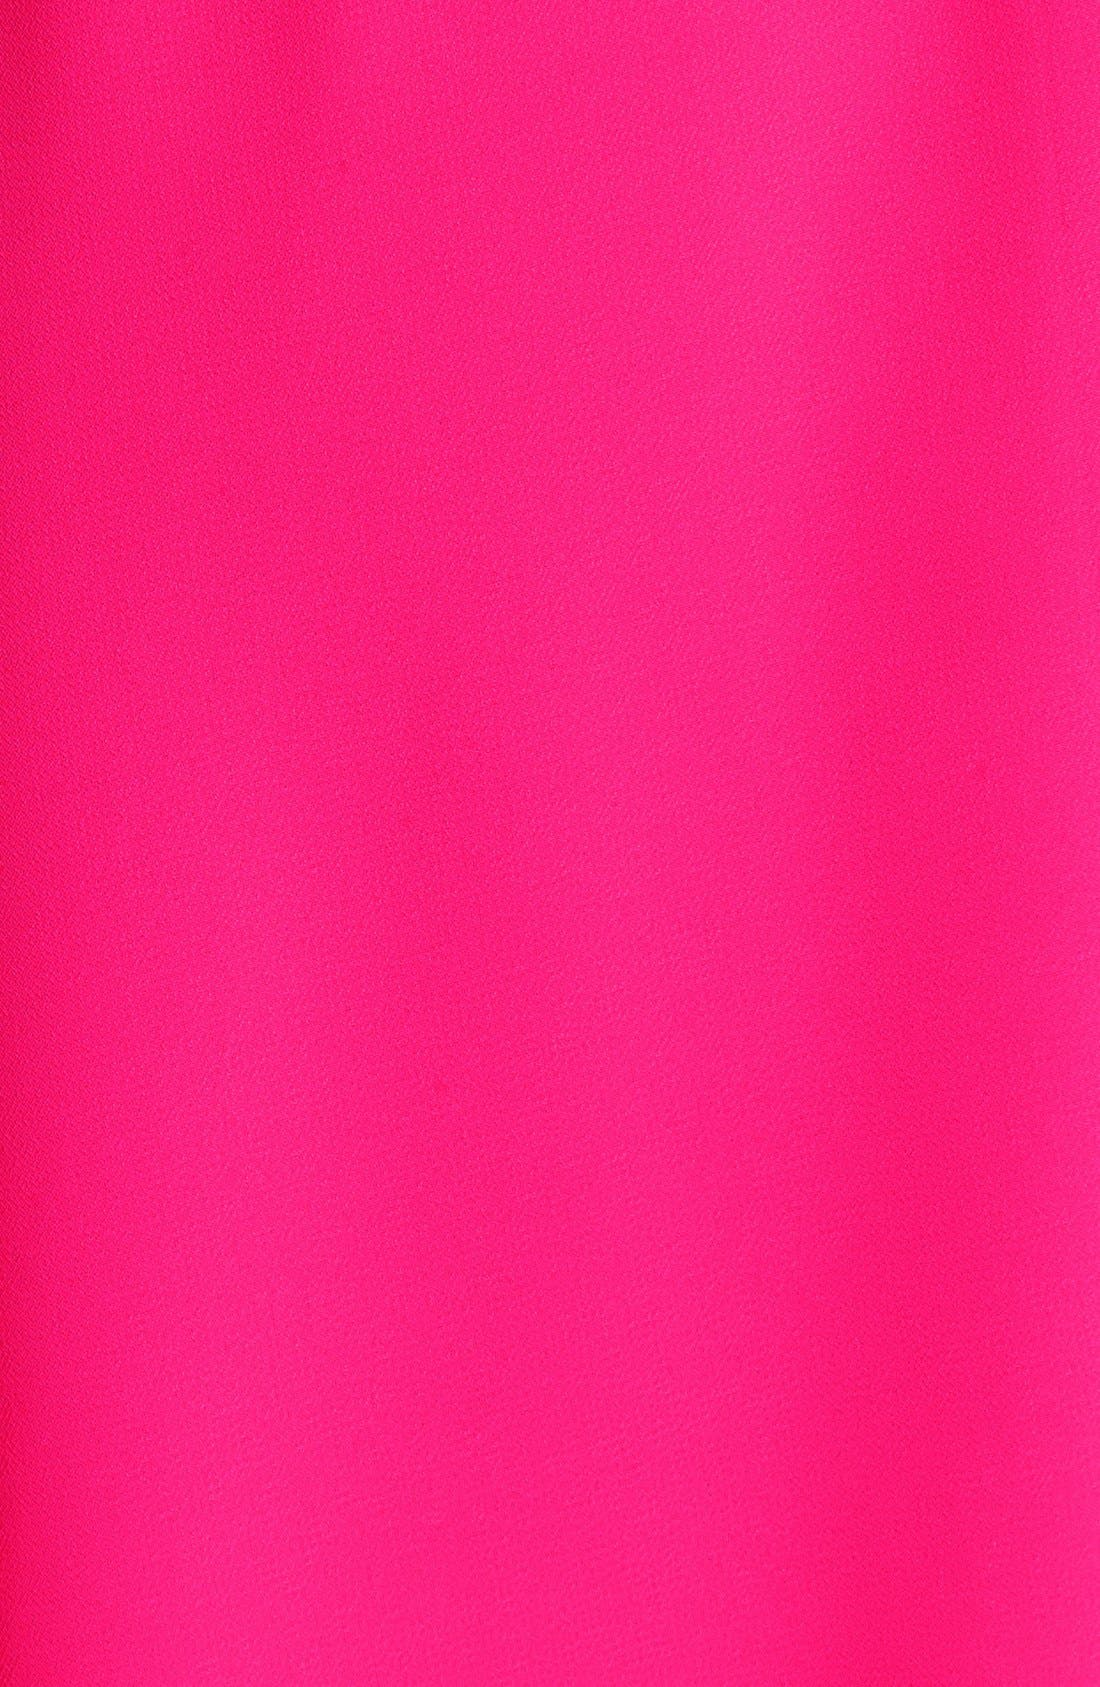 Blouson Chiffon Skater Dress,                             Alternate thumbnail 148, color,